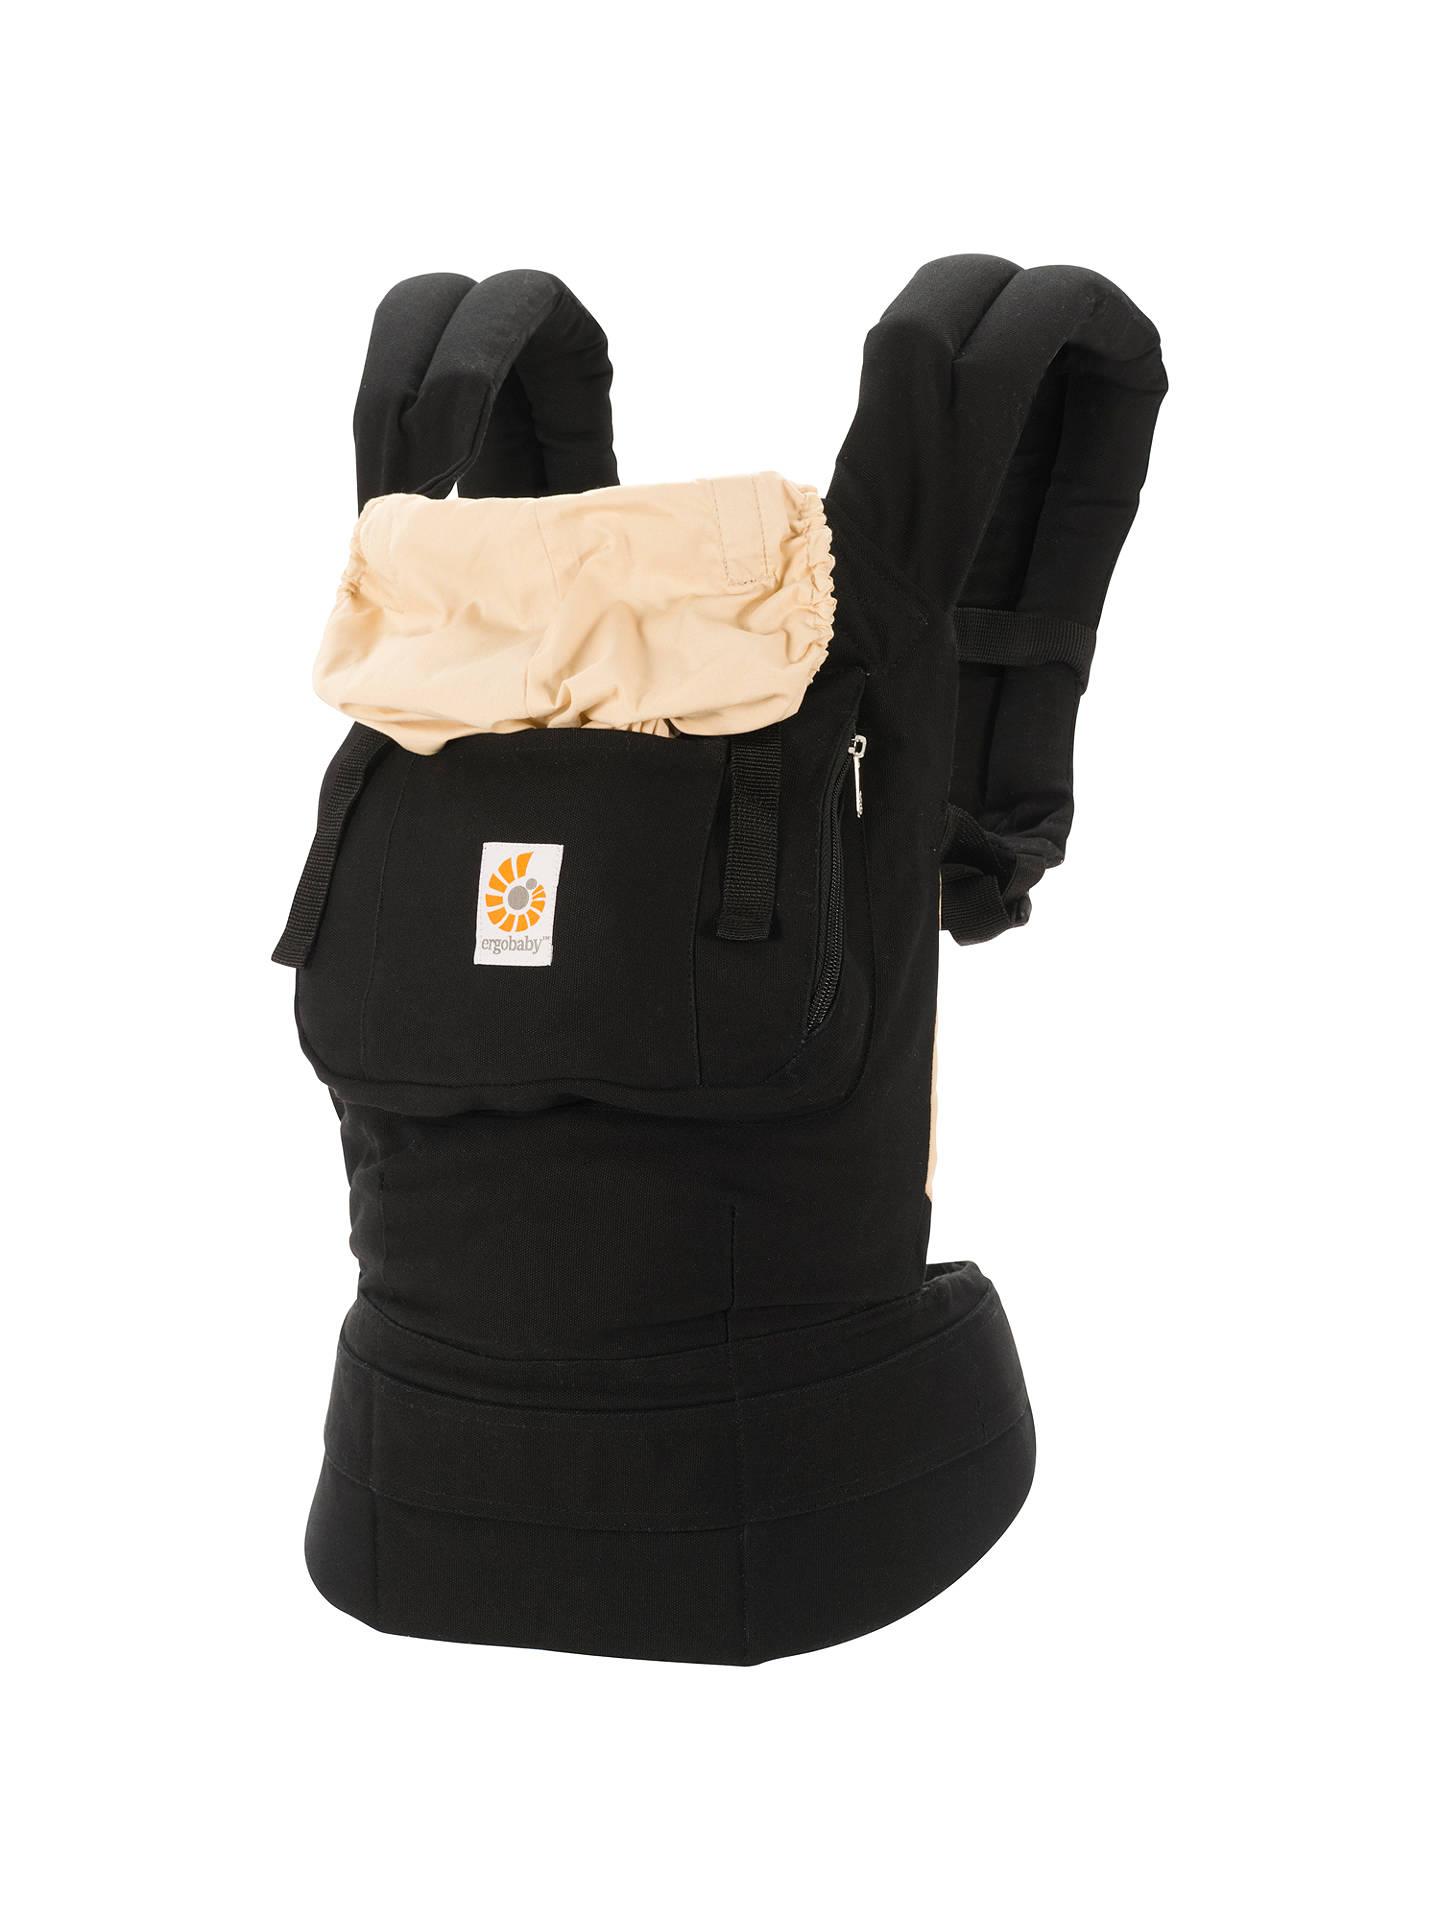 8a7330dd559 ... Buy Ergobaby Bundle of Joy Baby Carrier